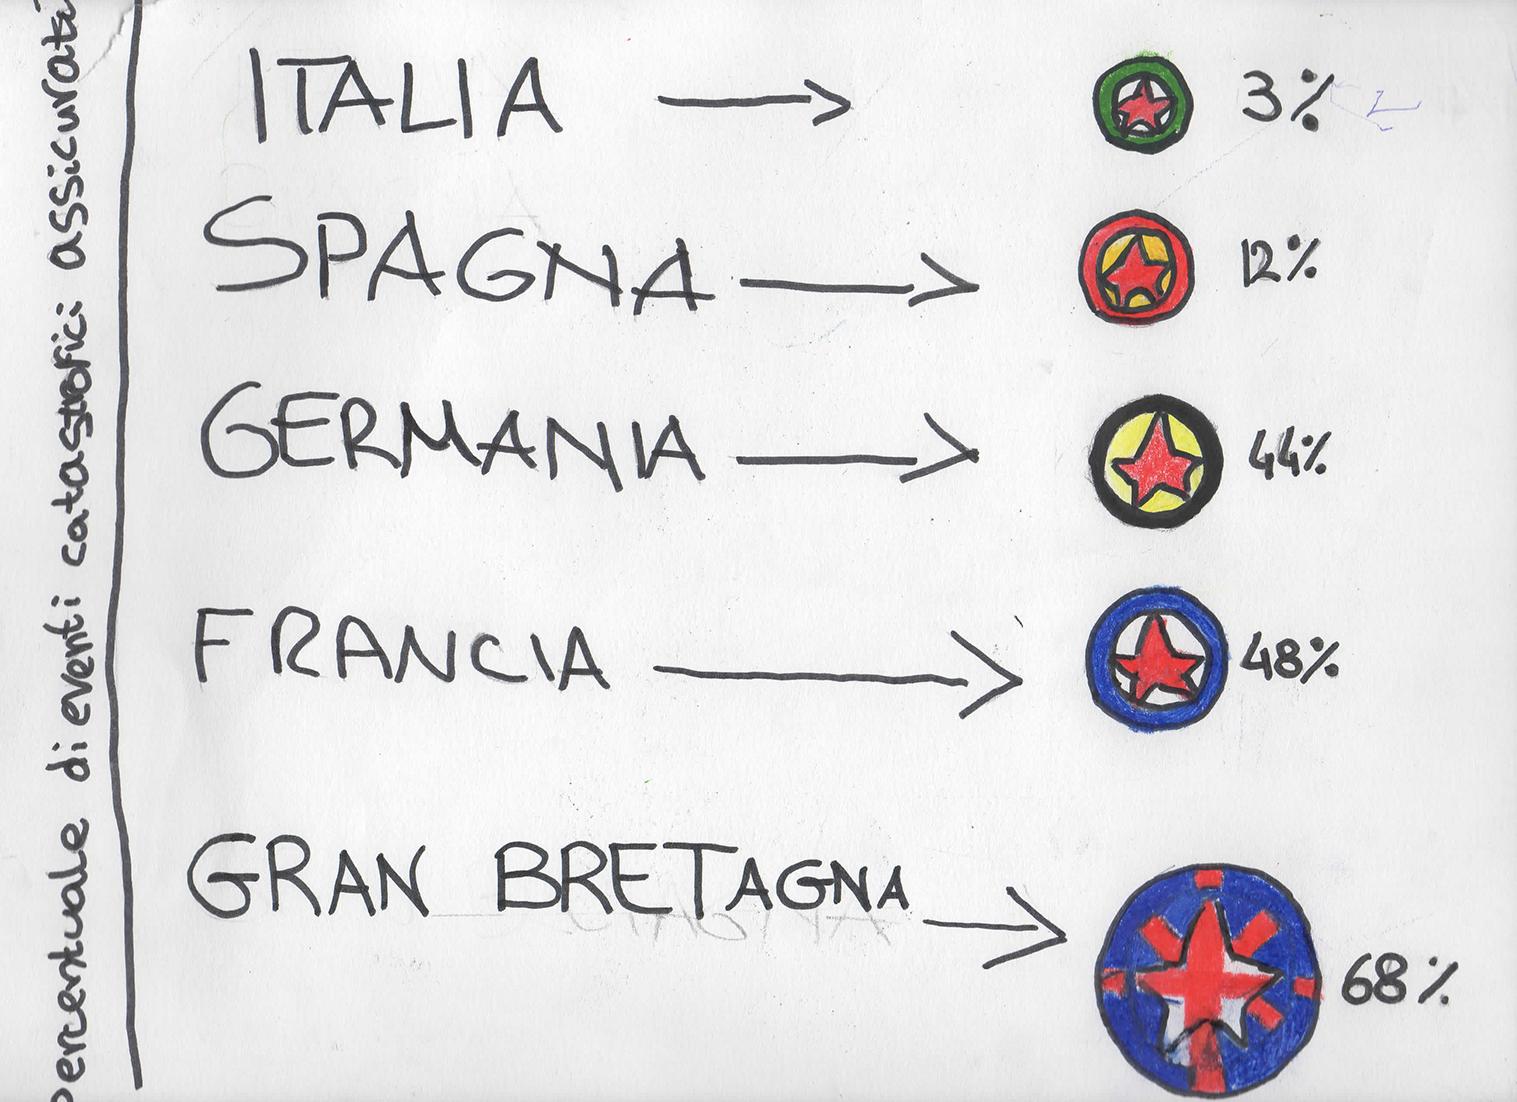 infografica di G. Apicella, F. Pierucci, L. Salvatori, R. Vitali, G. D'ugo (IIIC I.C. Frascati)